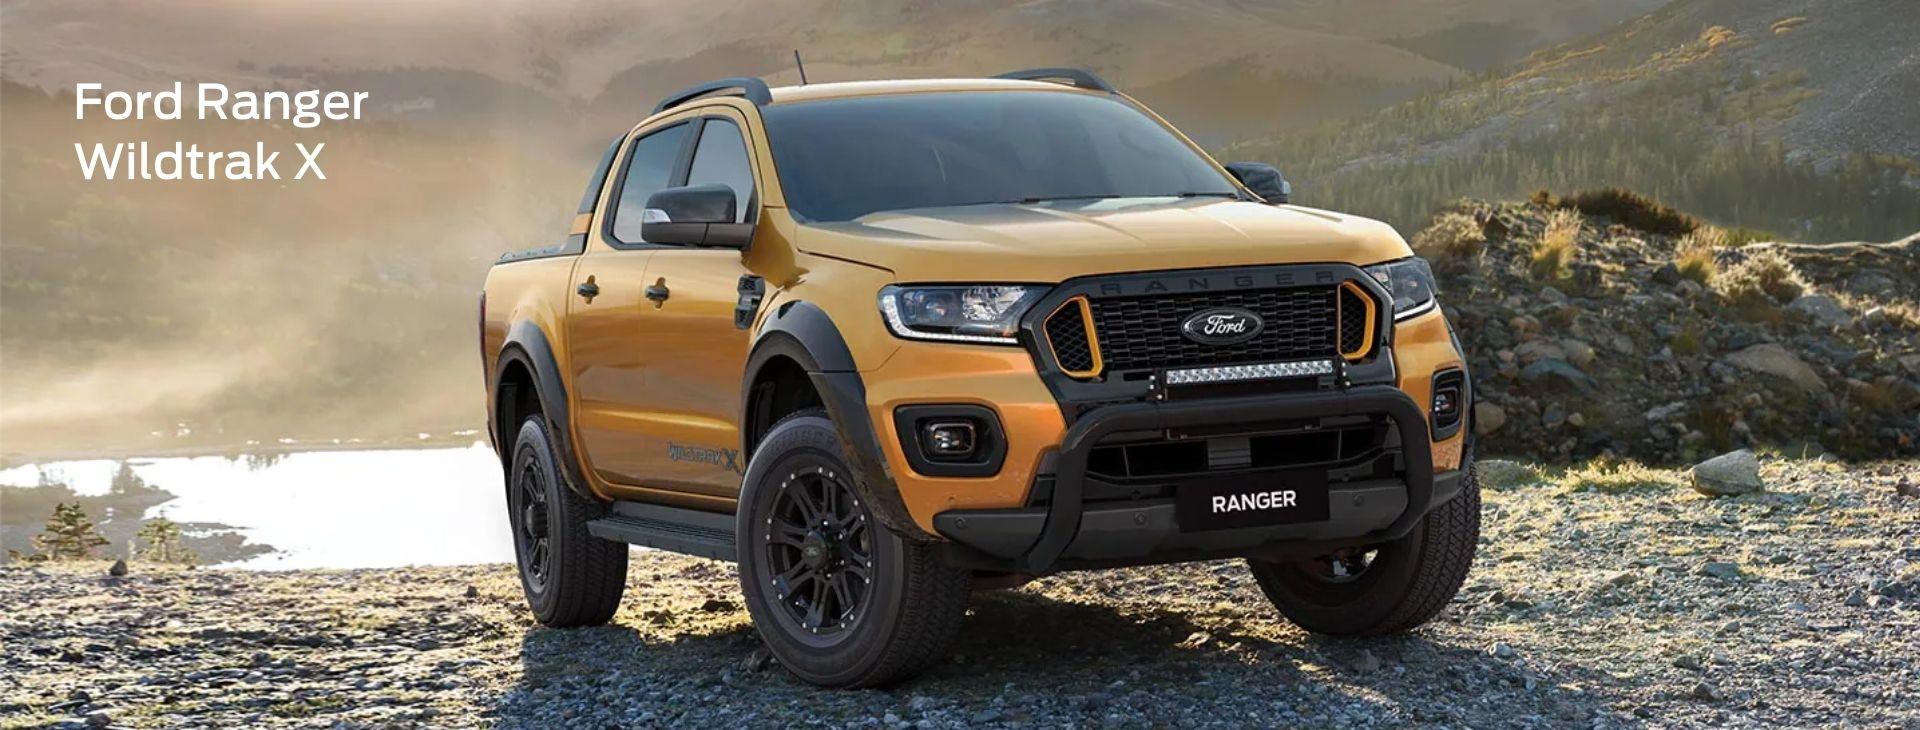 Ford Ranger Wildtrak X